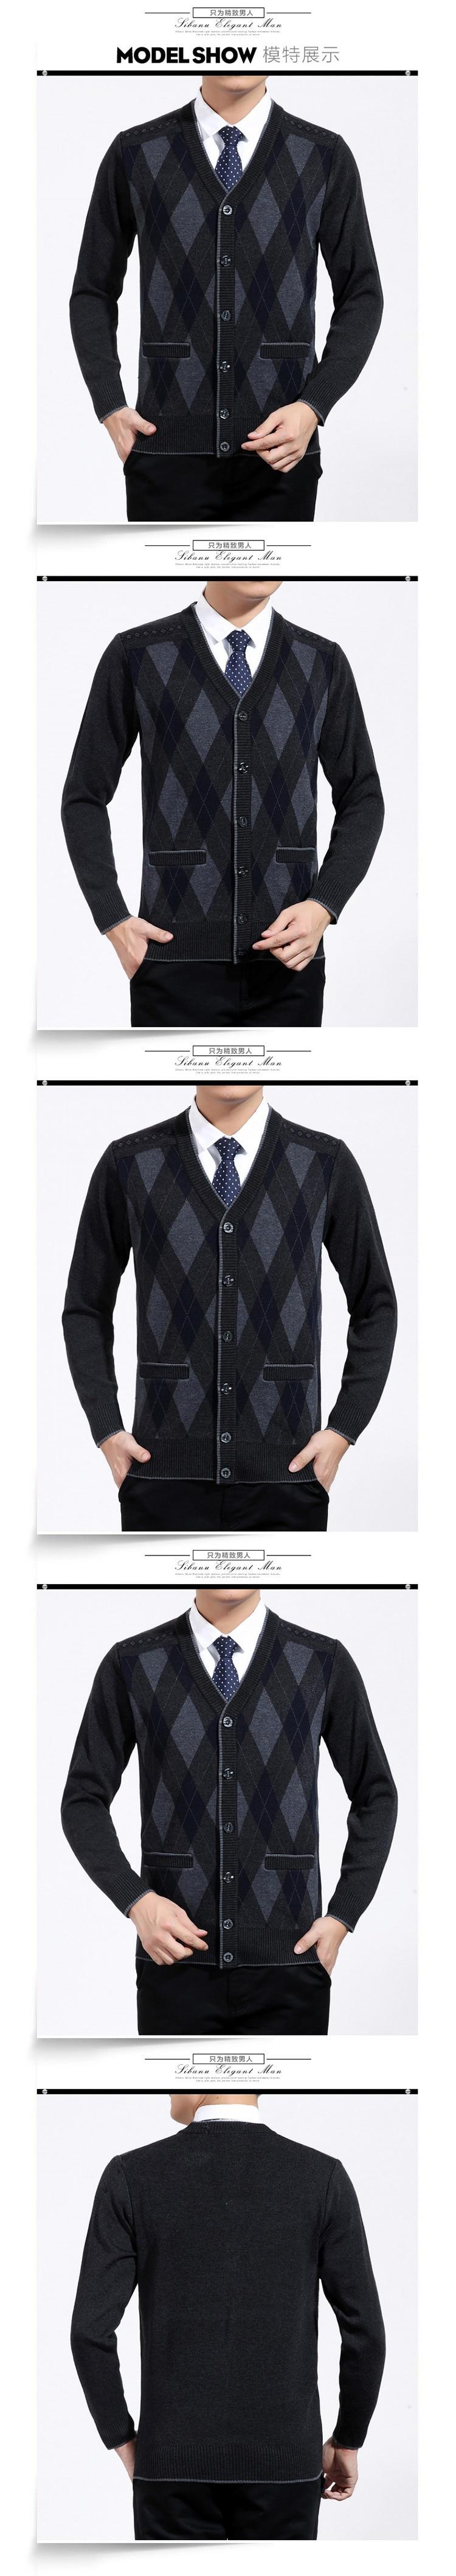 Man Woollen Cashmere Cardigan Sweaters Textured Knitted Sweater Men V-neck Cardigan Elegance Knitwear Business Casual Wear (7)